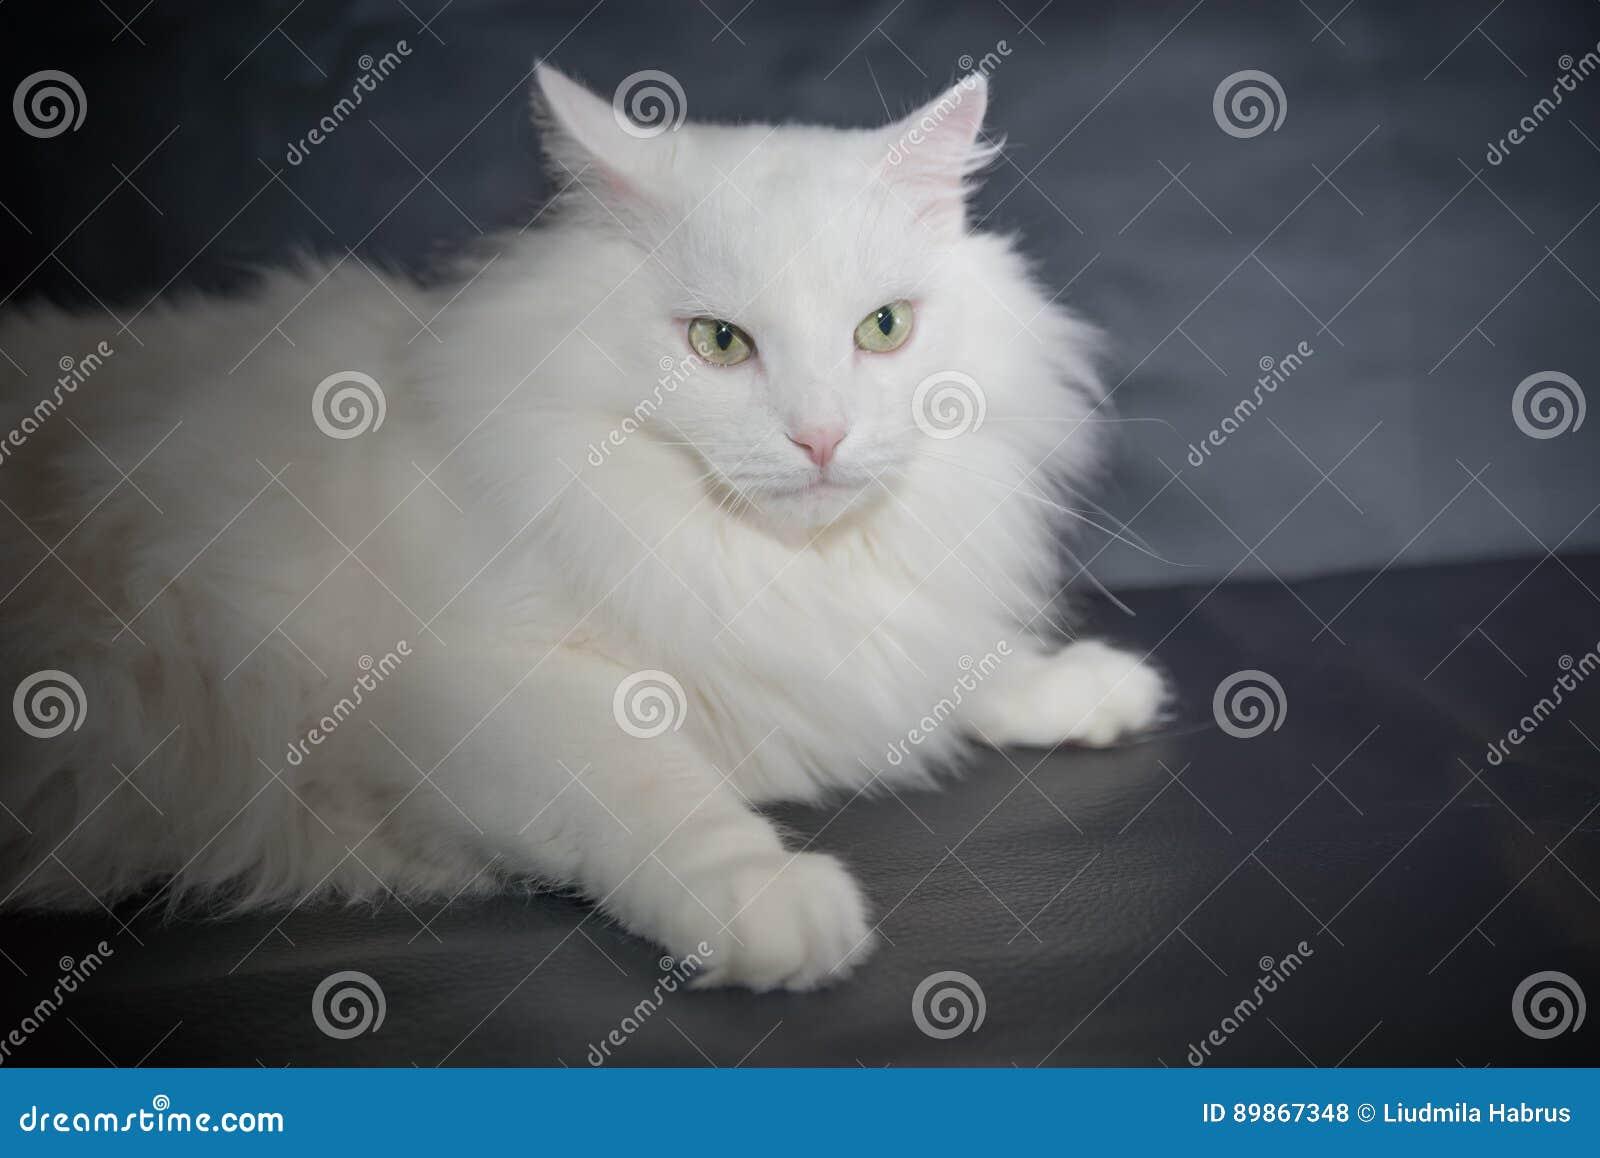 White Cat Breed Persian Angora Stock Photo Image Of Fluffy